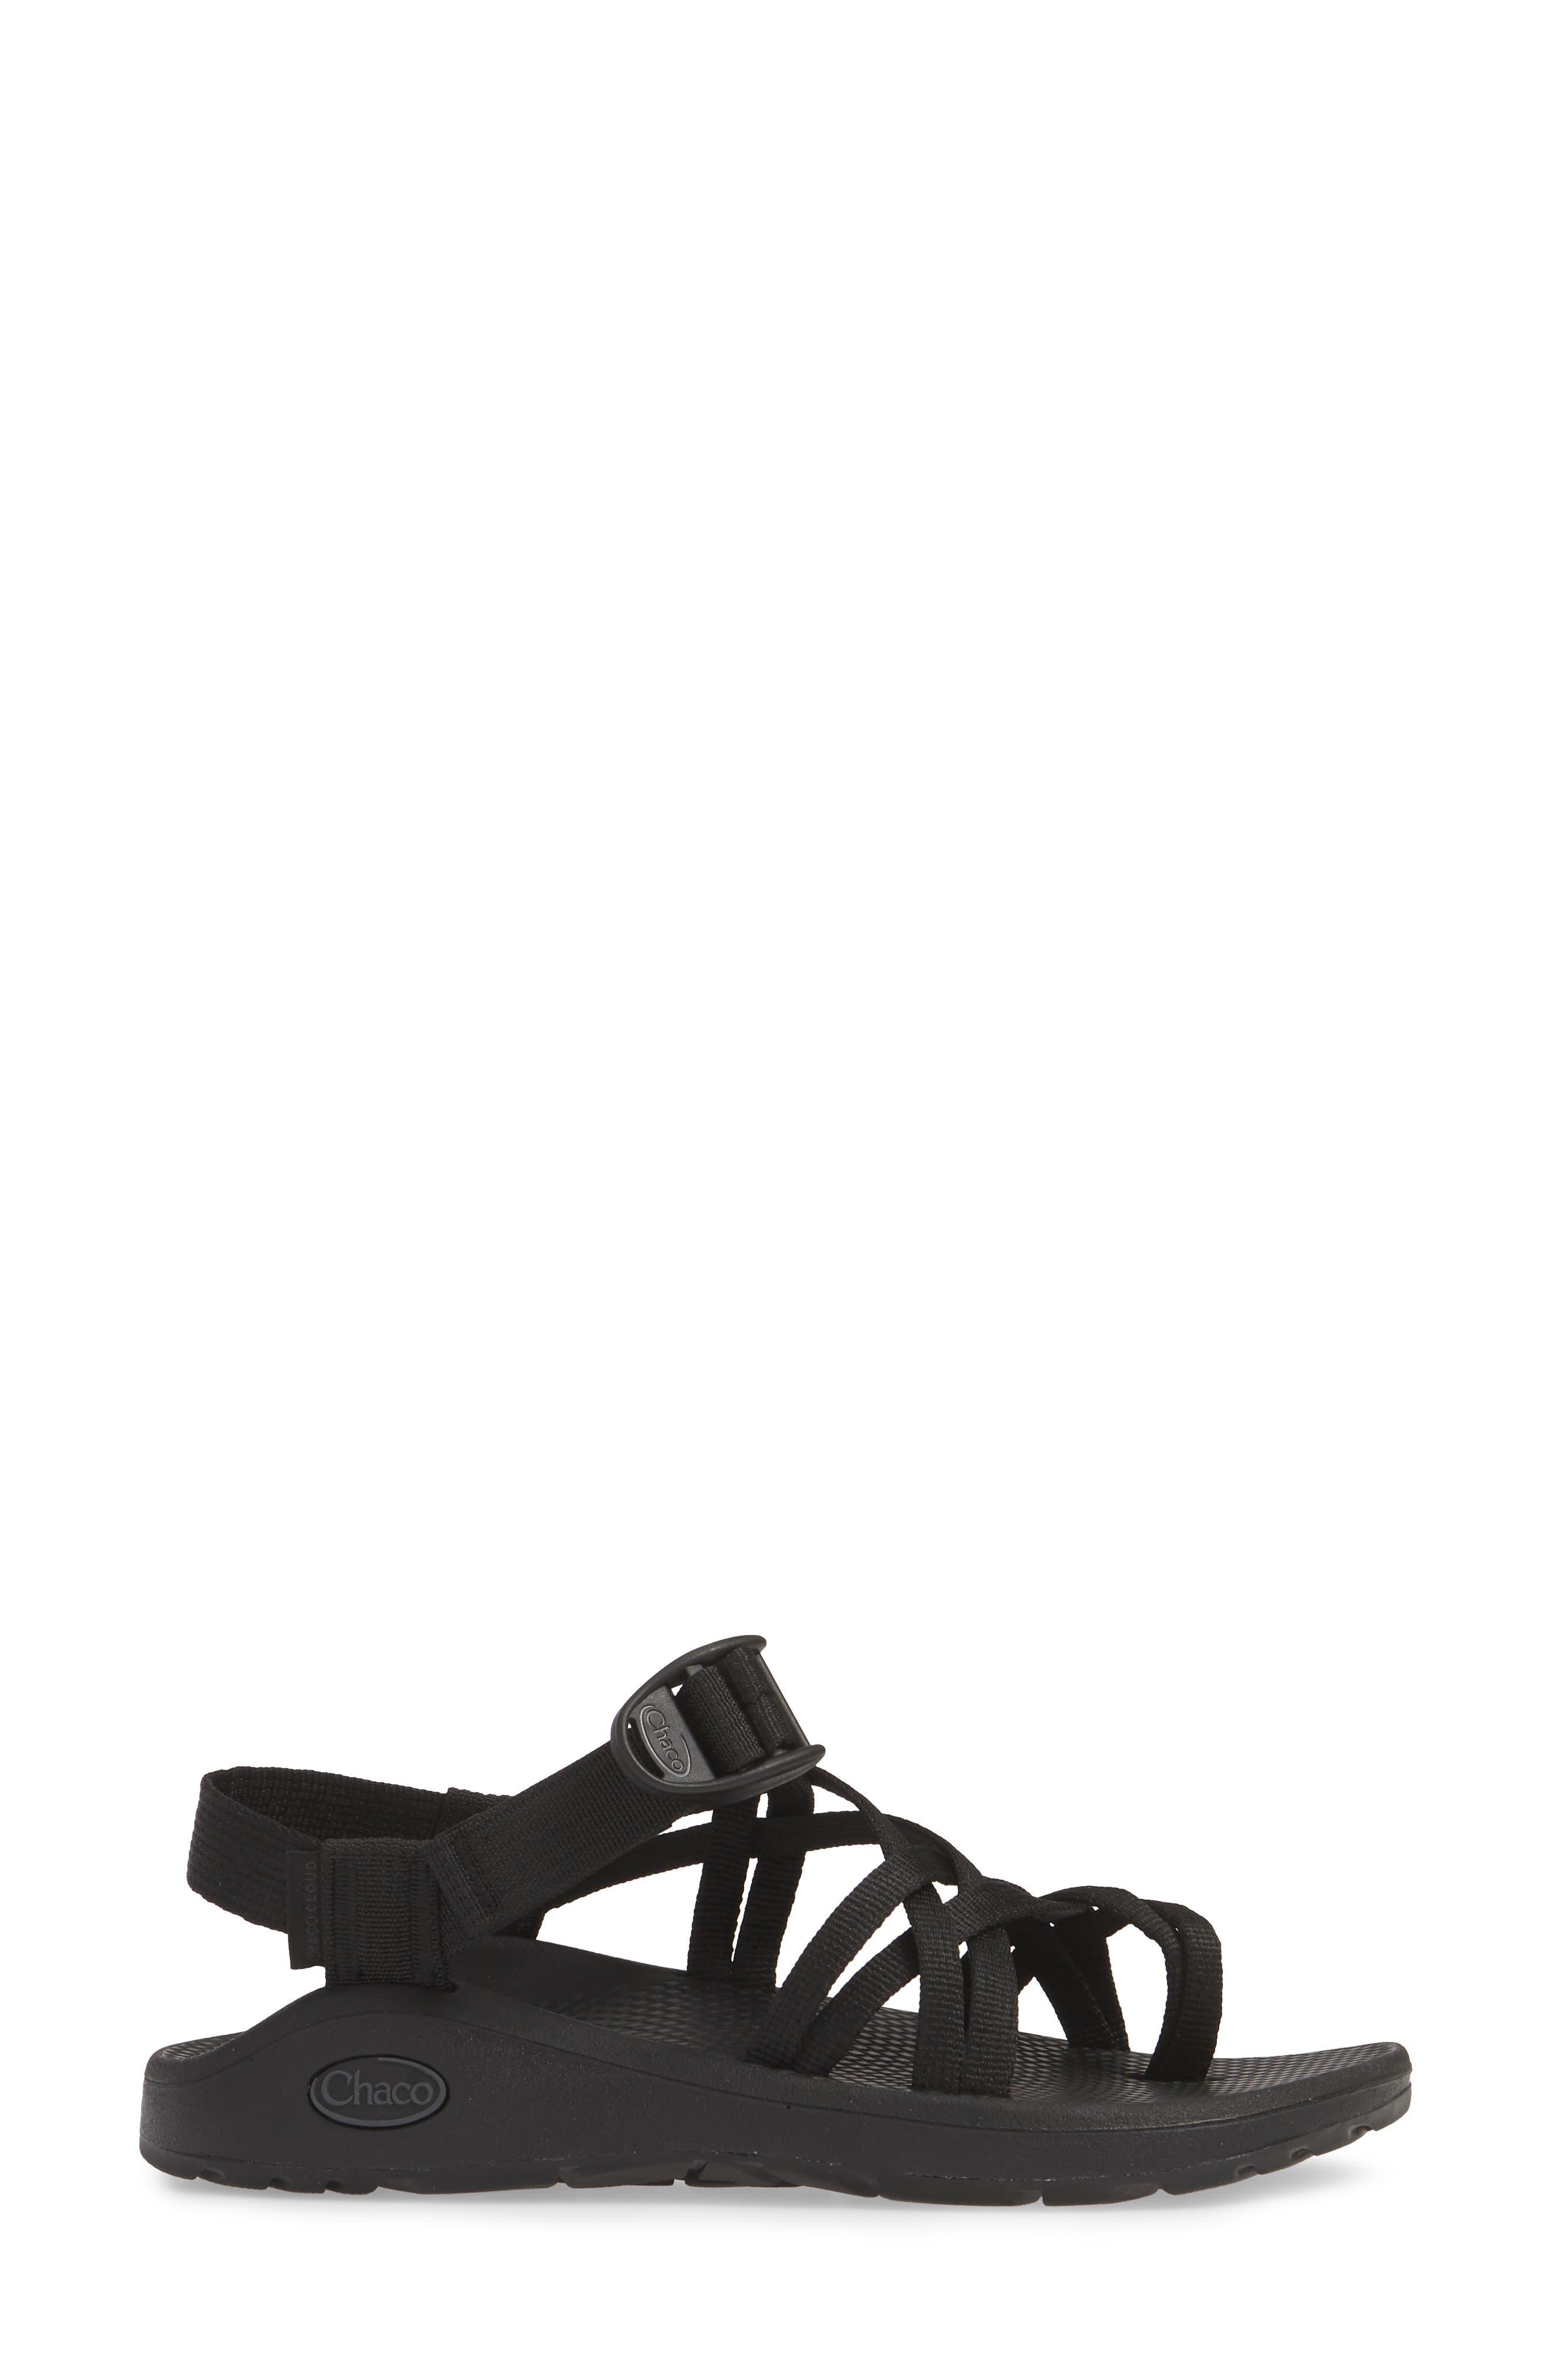 CHACO,                             Z/Cloud X2 Sandal,                             Alternate thumbnail 3, color,                             SOLID BLACK FABRIC